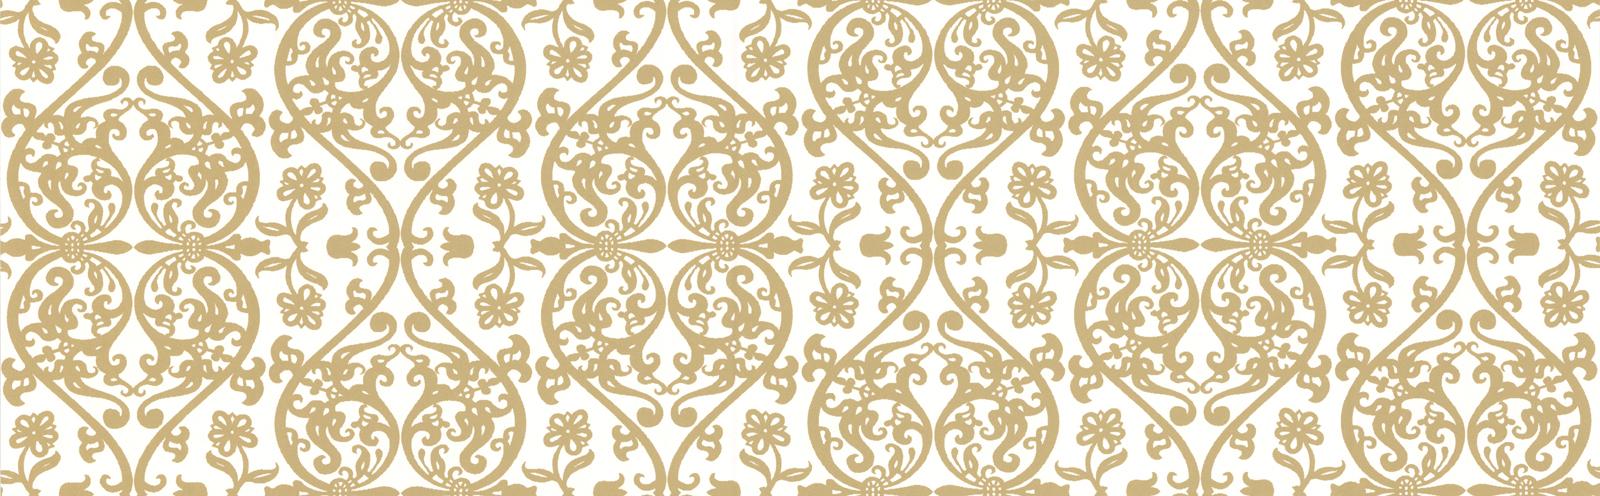 white and gold wallpaper wallpapersafari